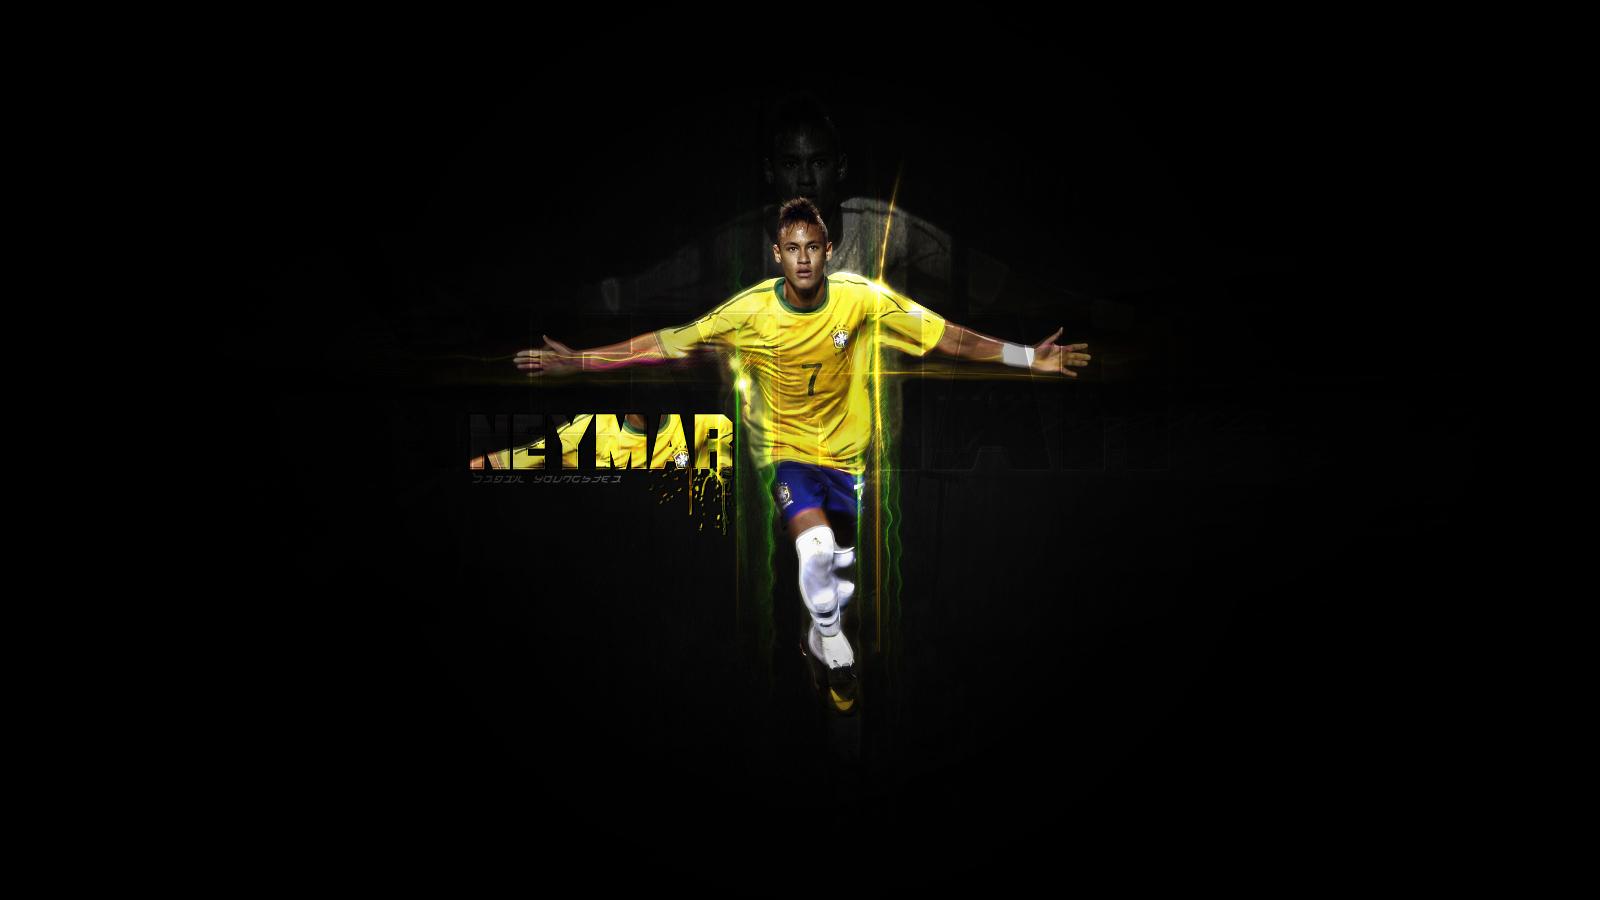 Cars Full Movie Online Free >> Neymar Full HD Wallpapers - Wallpapers FULL HD